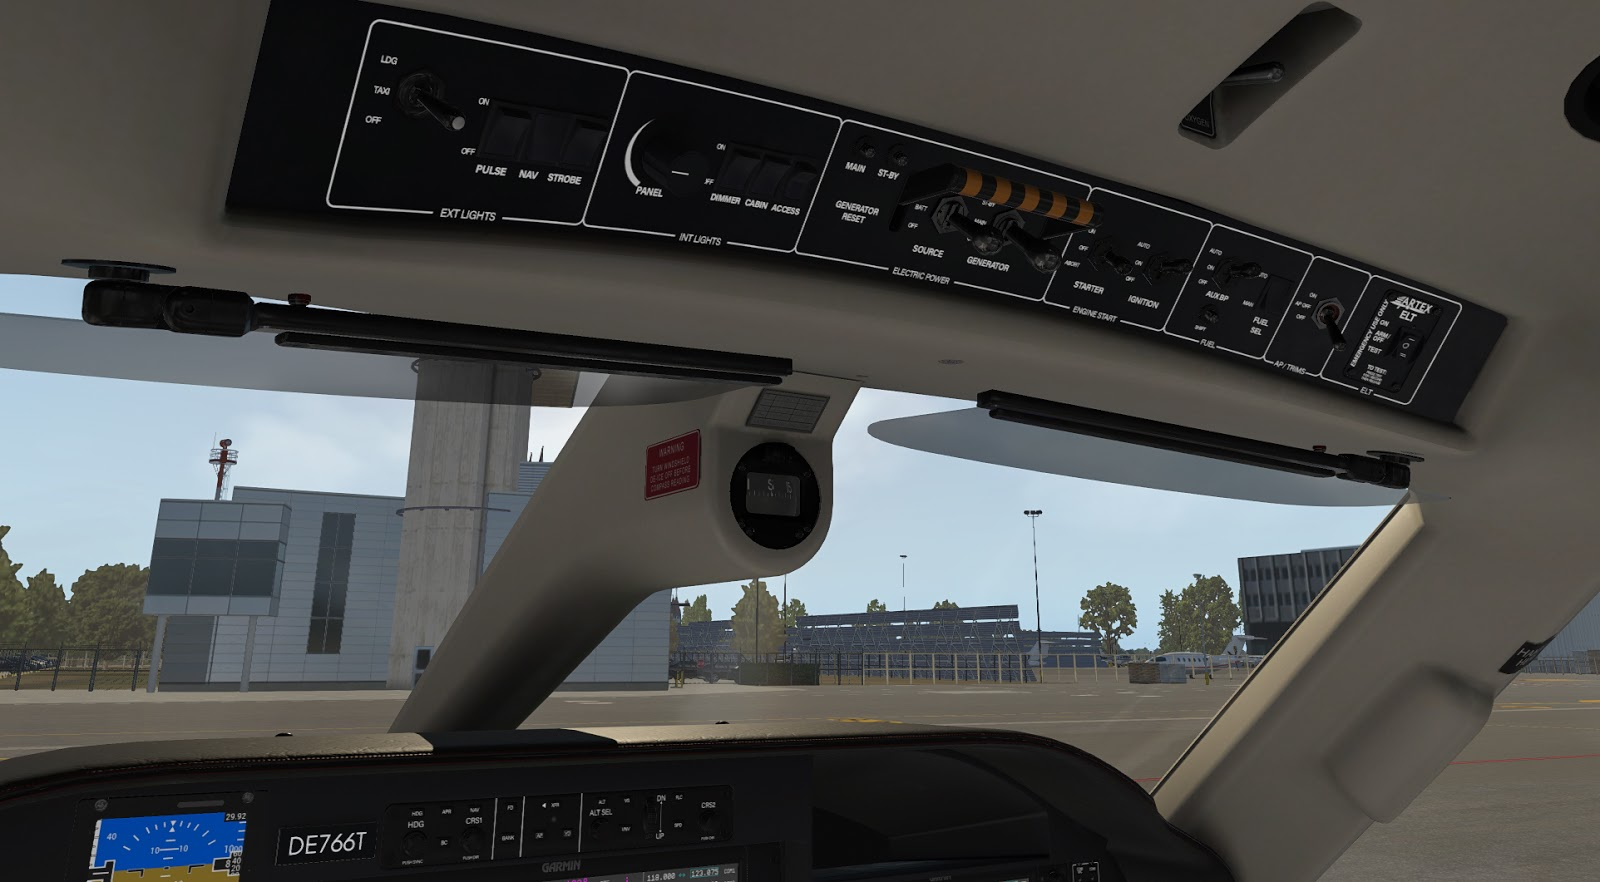 HotStart Socata TBM 900 - First Impressions